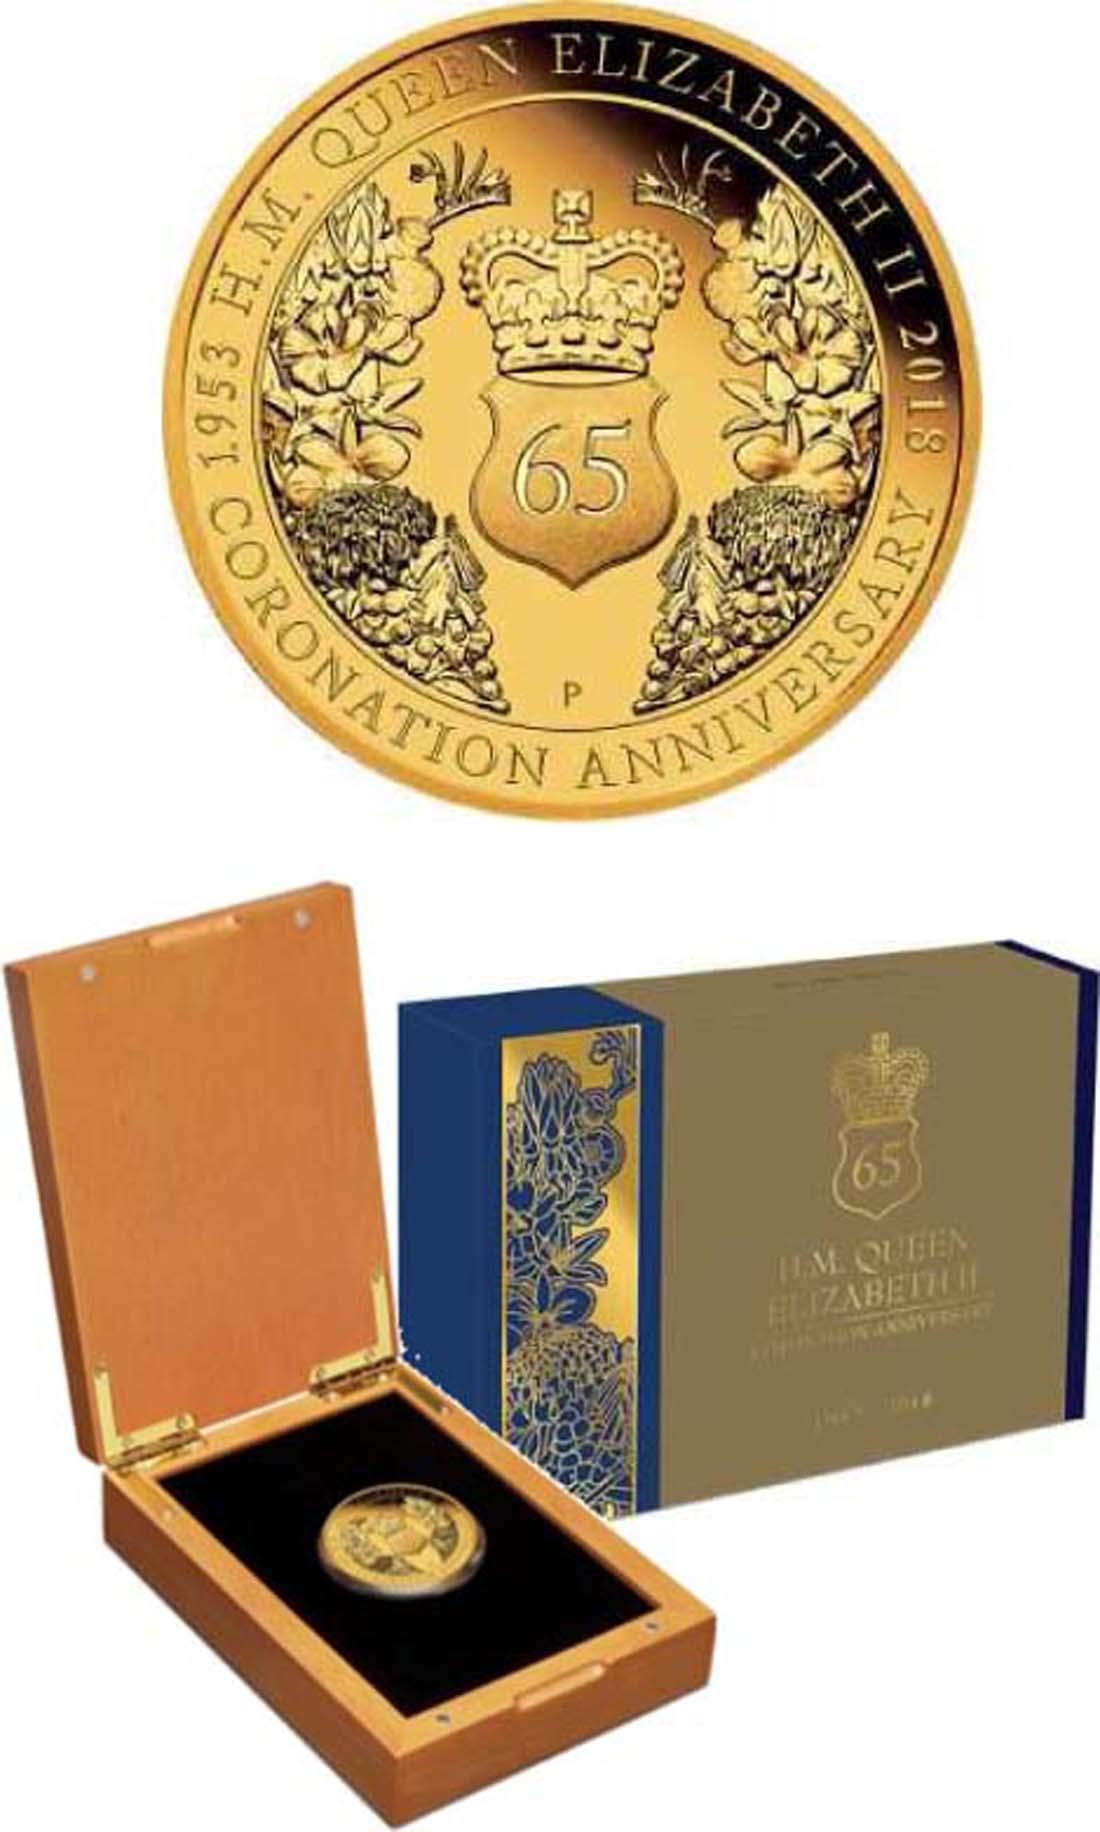 Australien : 200 Dollar 25 $ 2018 Elizabeth II. - 65. Krönungsjubiläum  2018 PP